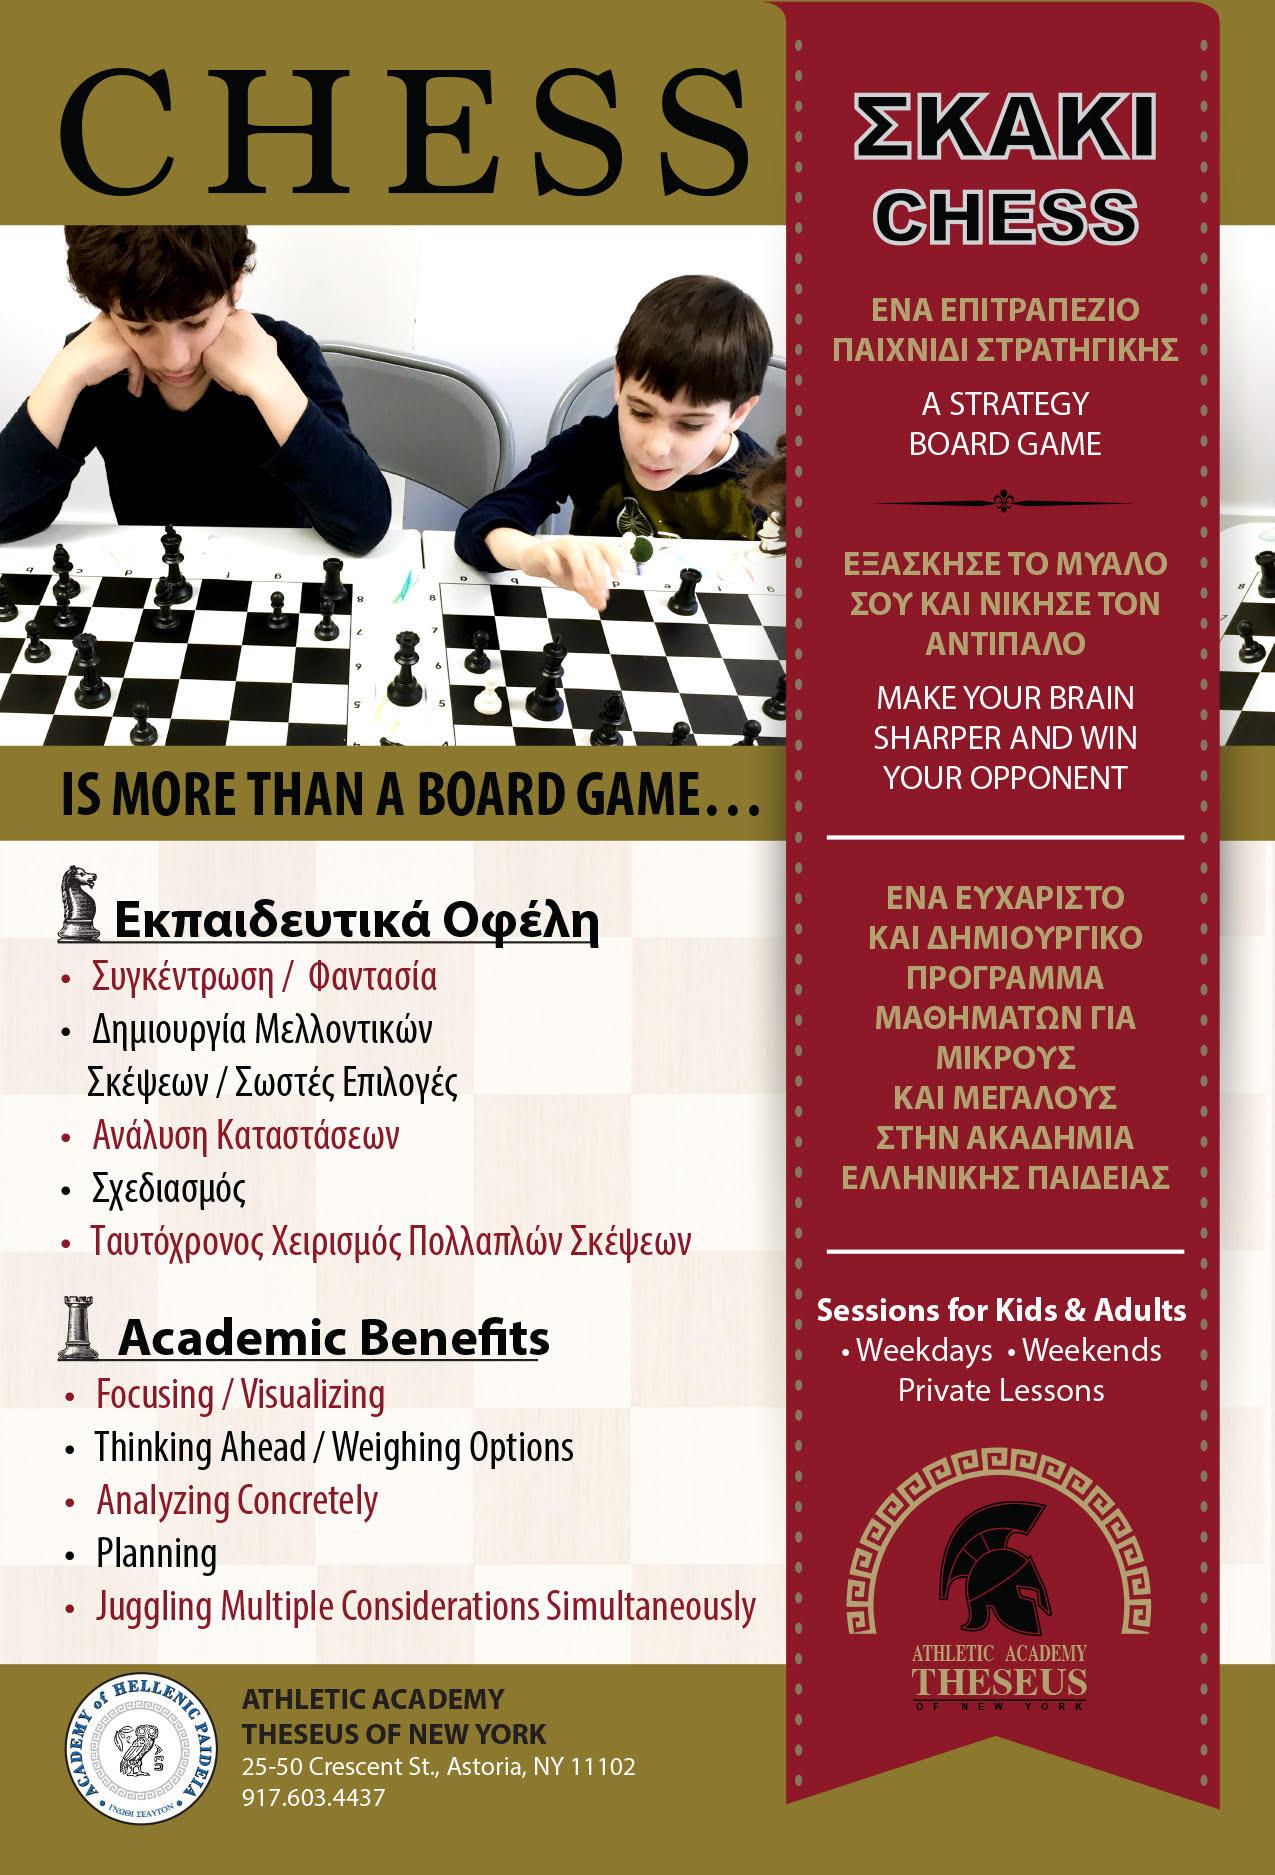 Chess Flyer.jpg